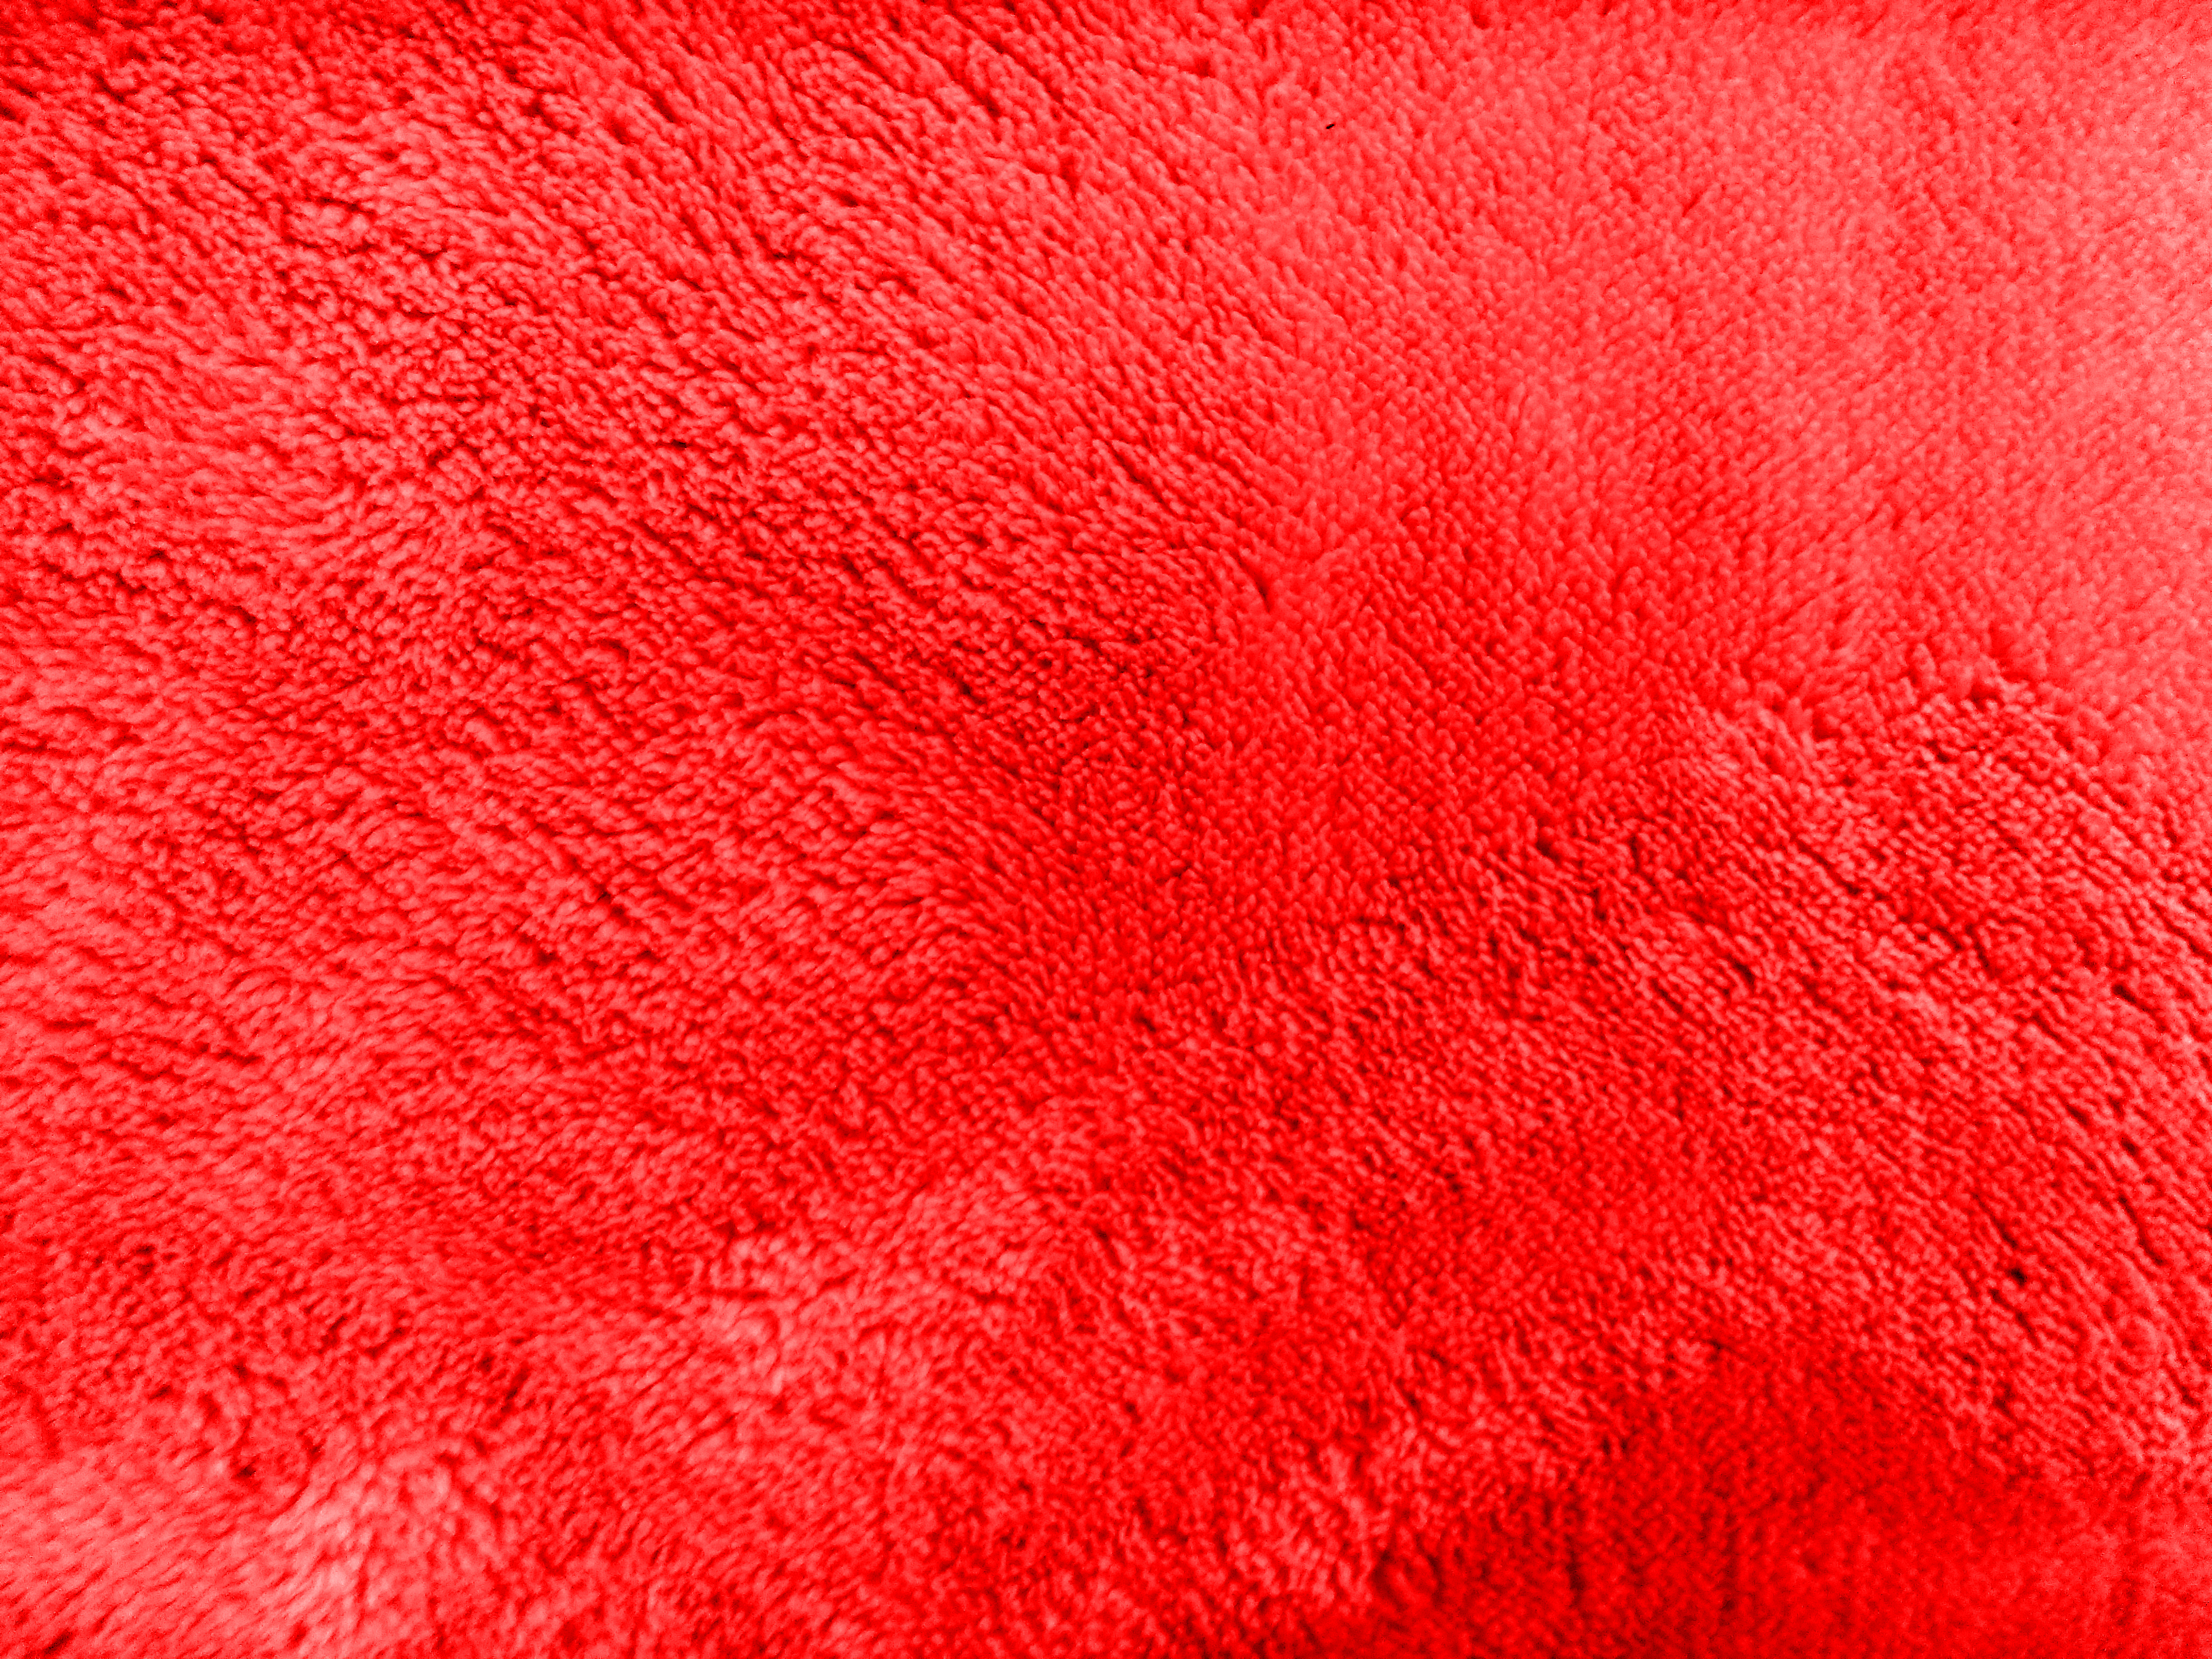 Plush Red Bathmat Texture Picture Free Photograph